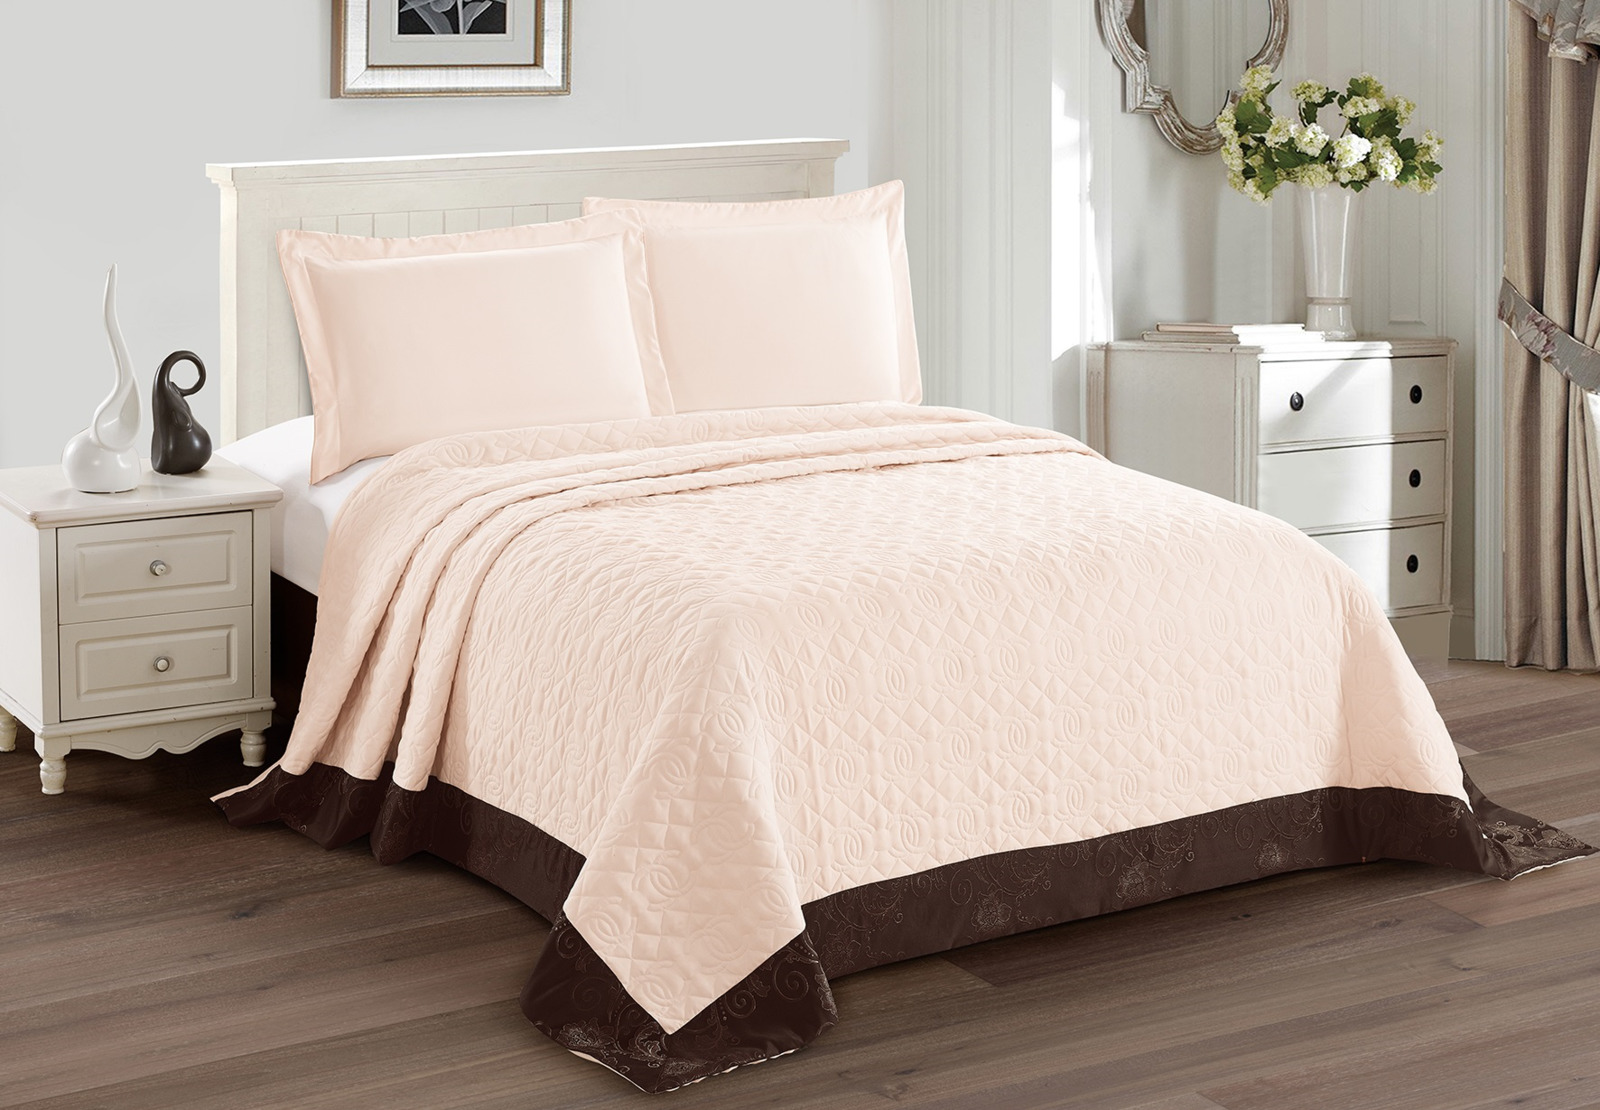 Покрывало с наволочками Cleo Monifico, 240/015-CH, светло-розовый, 240х260, наволочки 50х70, 2 шт цена